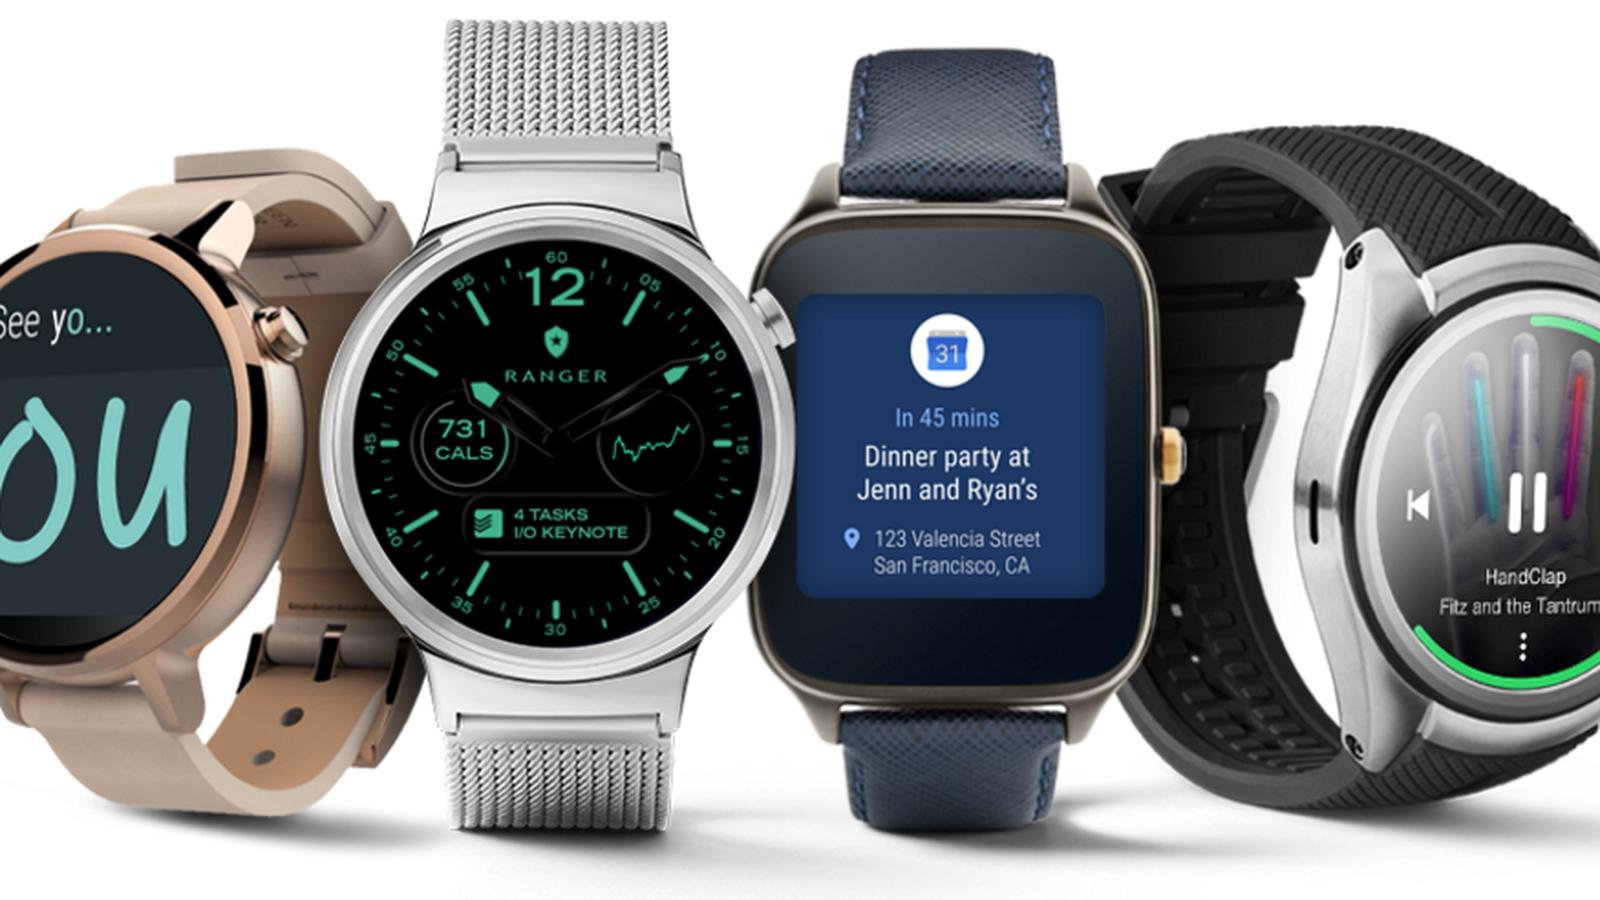 Ya se viene Android Wear 2.0